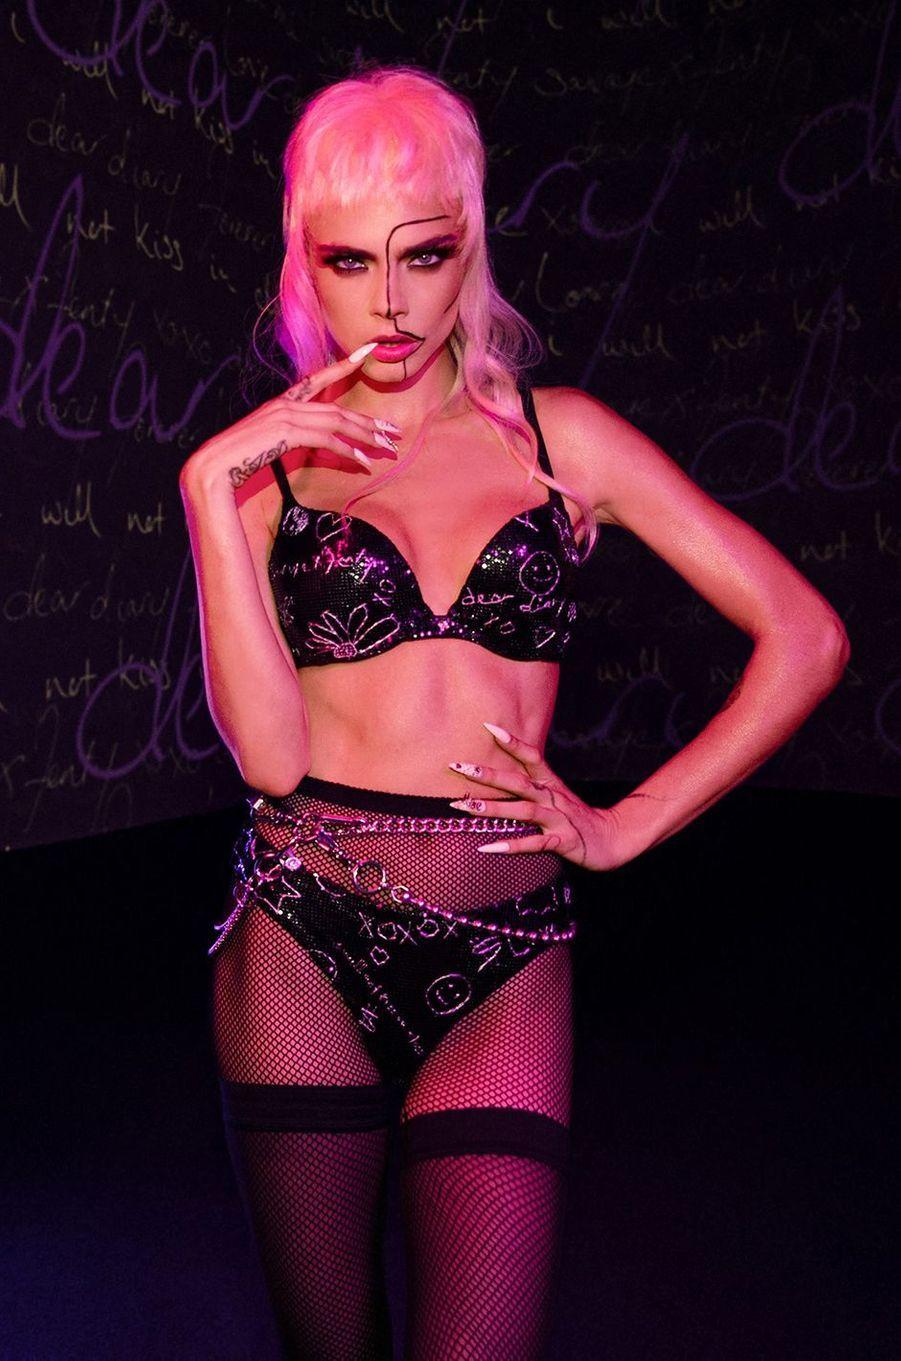 Cara Delevingnedéfile pour la marque de lingerie de Rihanna Savage x Fenty, octobre 2020